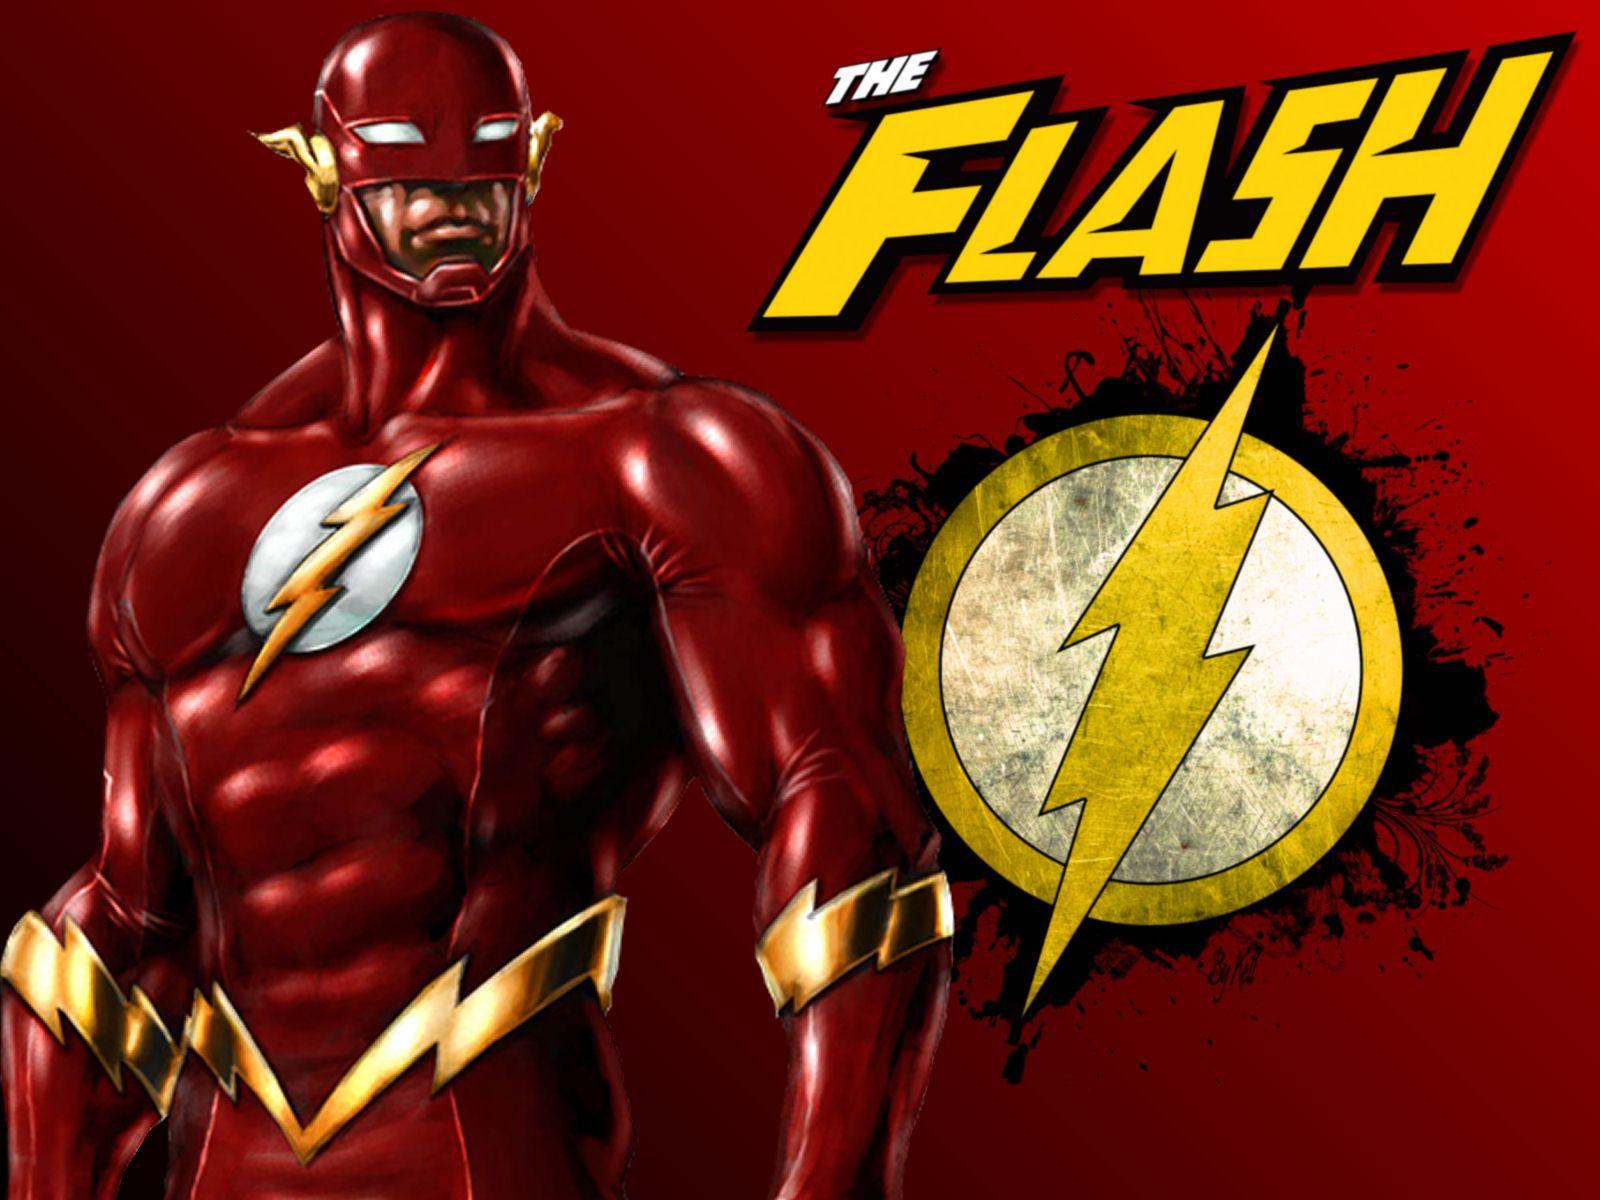 Superhero feats the flash wally west comics comics the flash et wally west - Flash le super heros ...